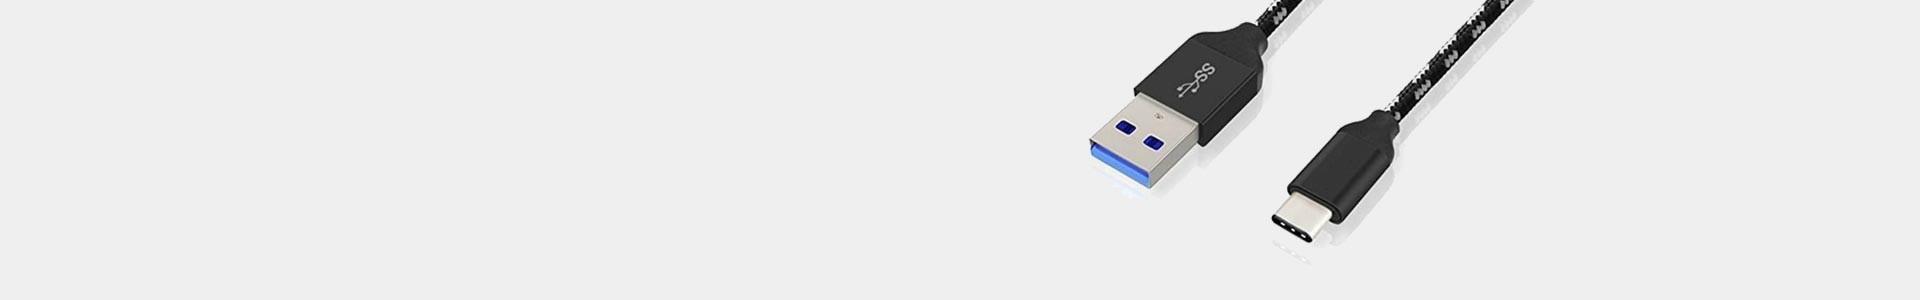 Cables USB de uso profesional - Calidad superior - Avacab